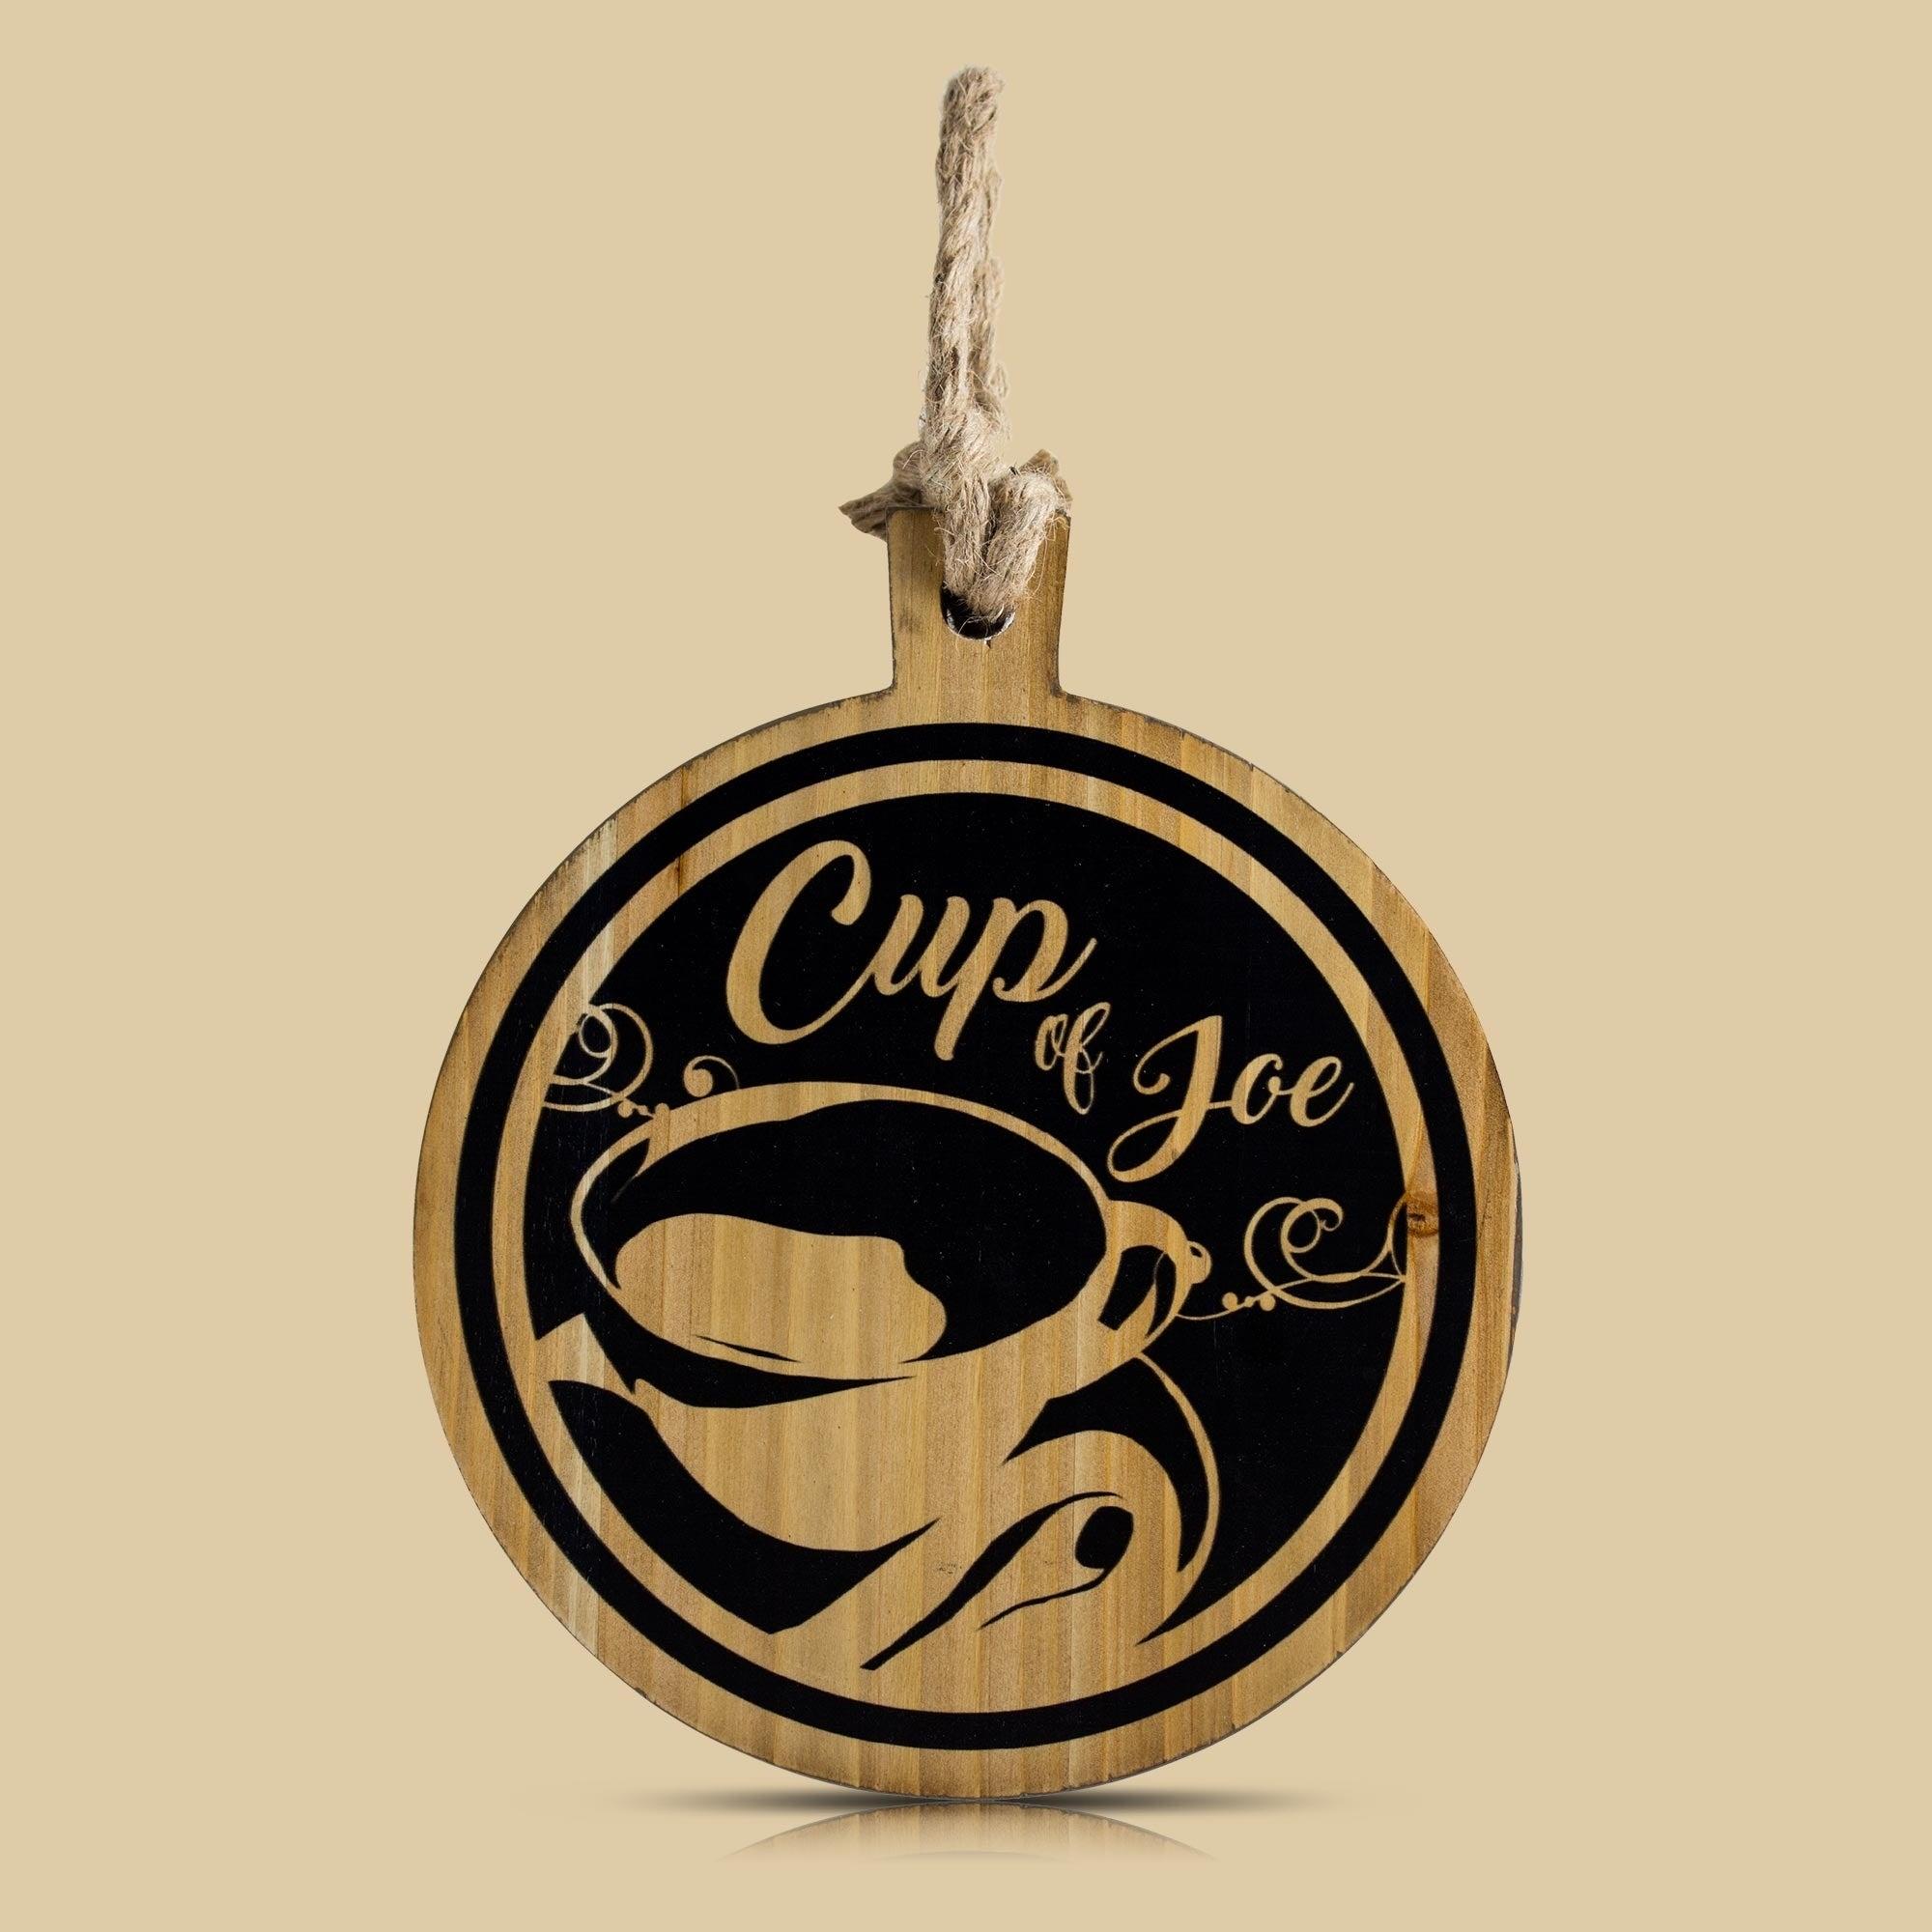 Shop American Art Decor Cup Of Joe Wood Coffee Wall Decor – Free Regarding Most Current Cup Of Joe Wall Decor (View 15 of 20)